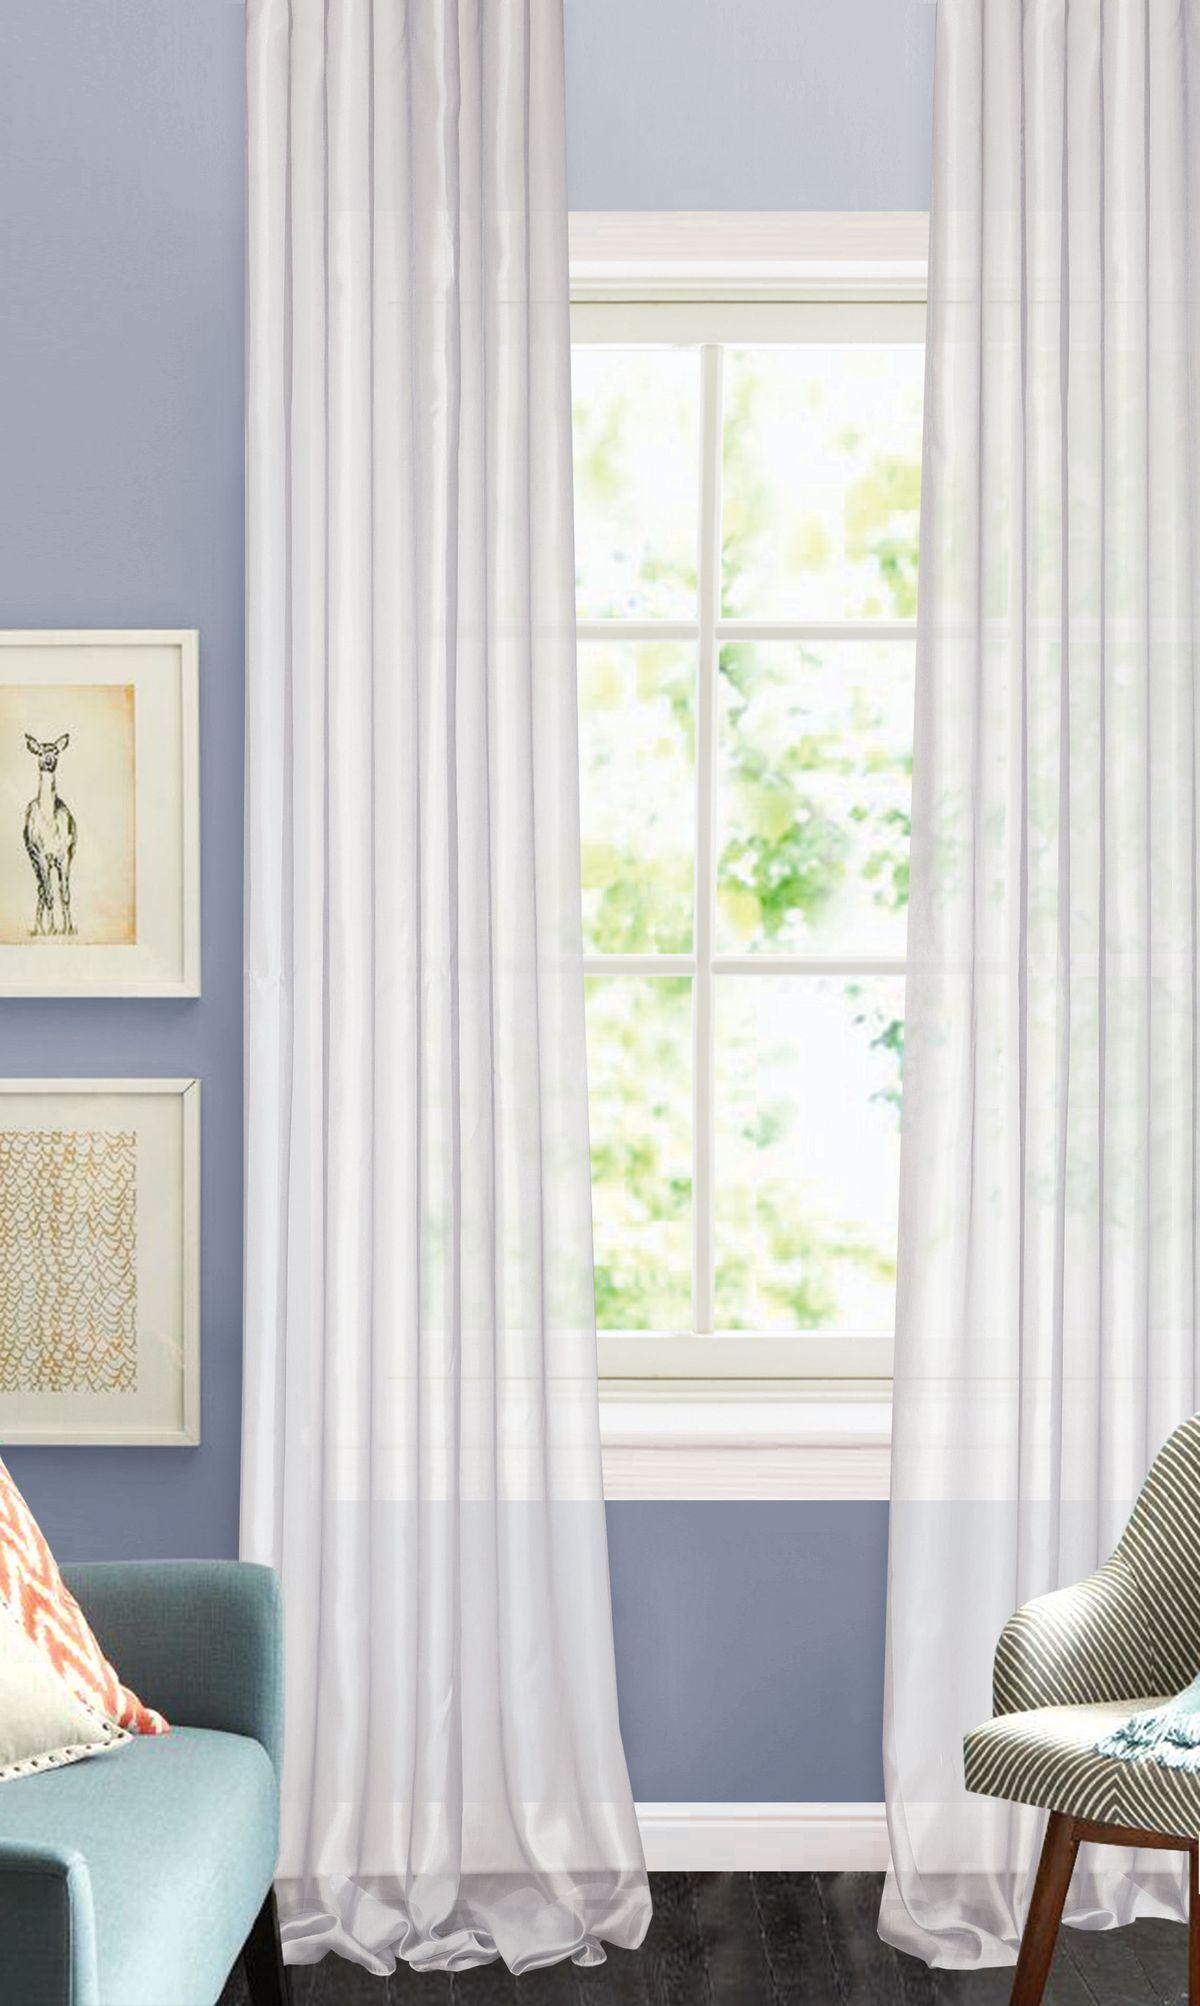 "Штора готовая ""Garden"", на ленте, цвет: бледно-сиреневый, 450 х 270 см. С W875 450х270 V30"